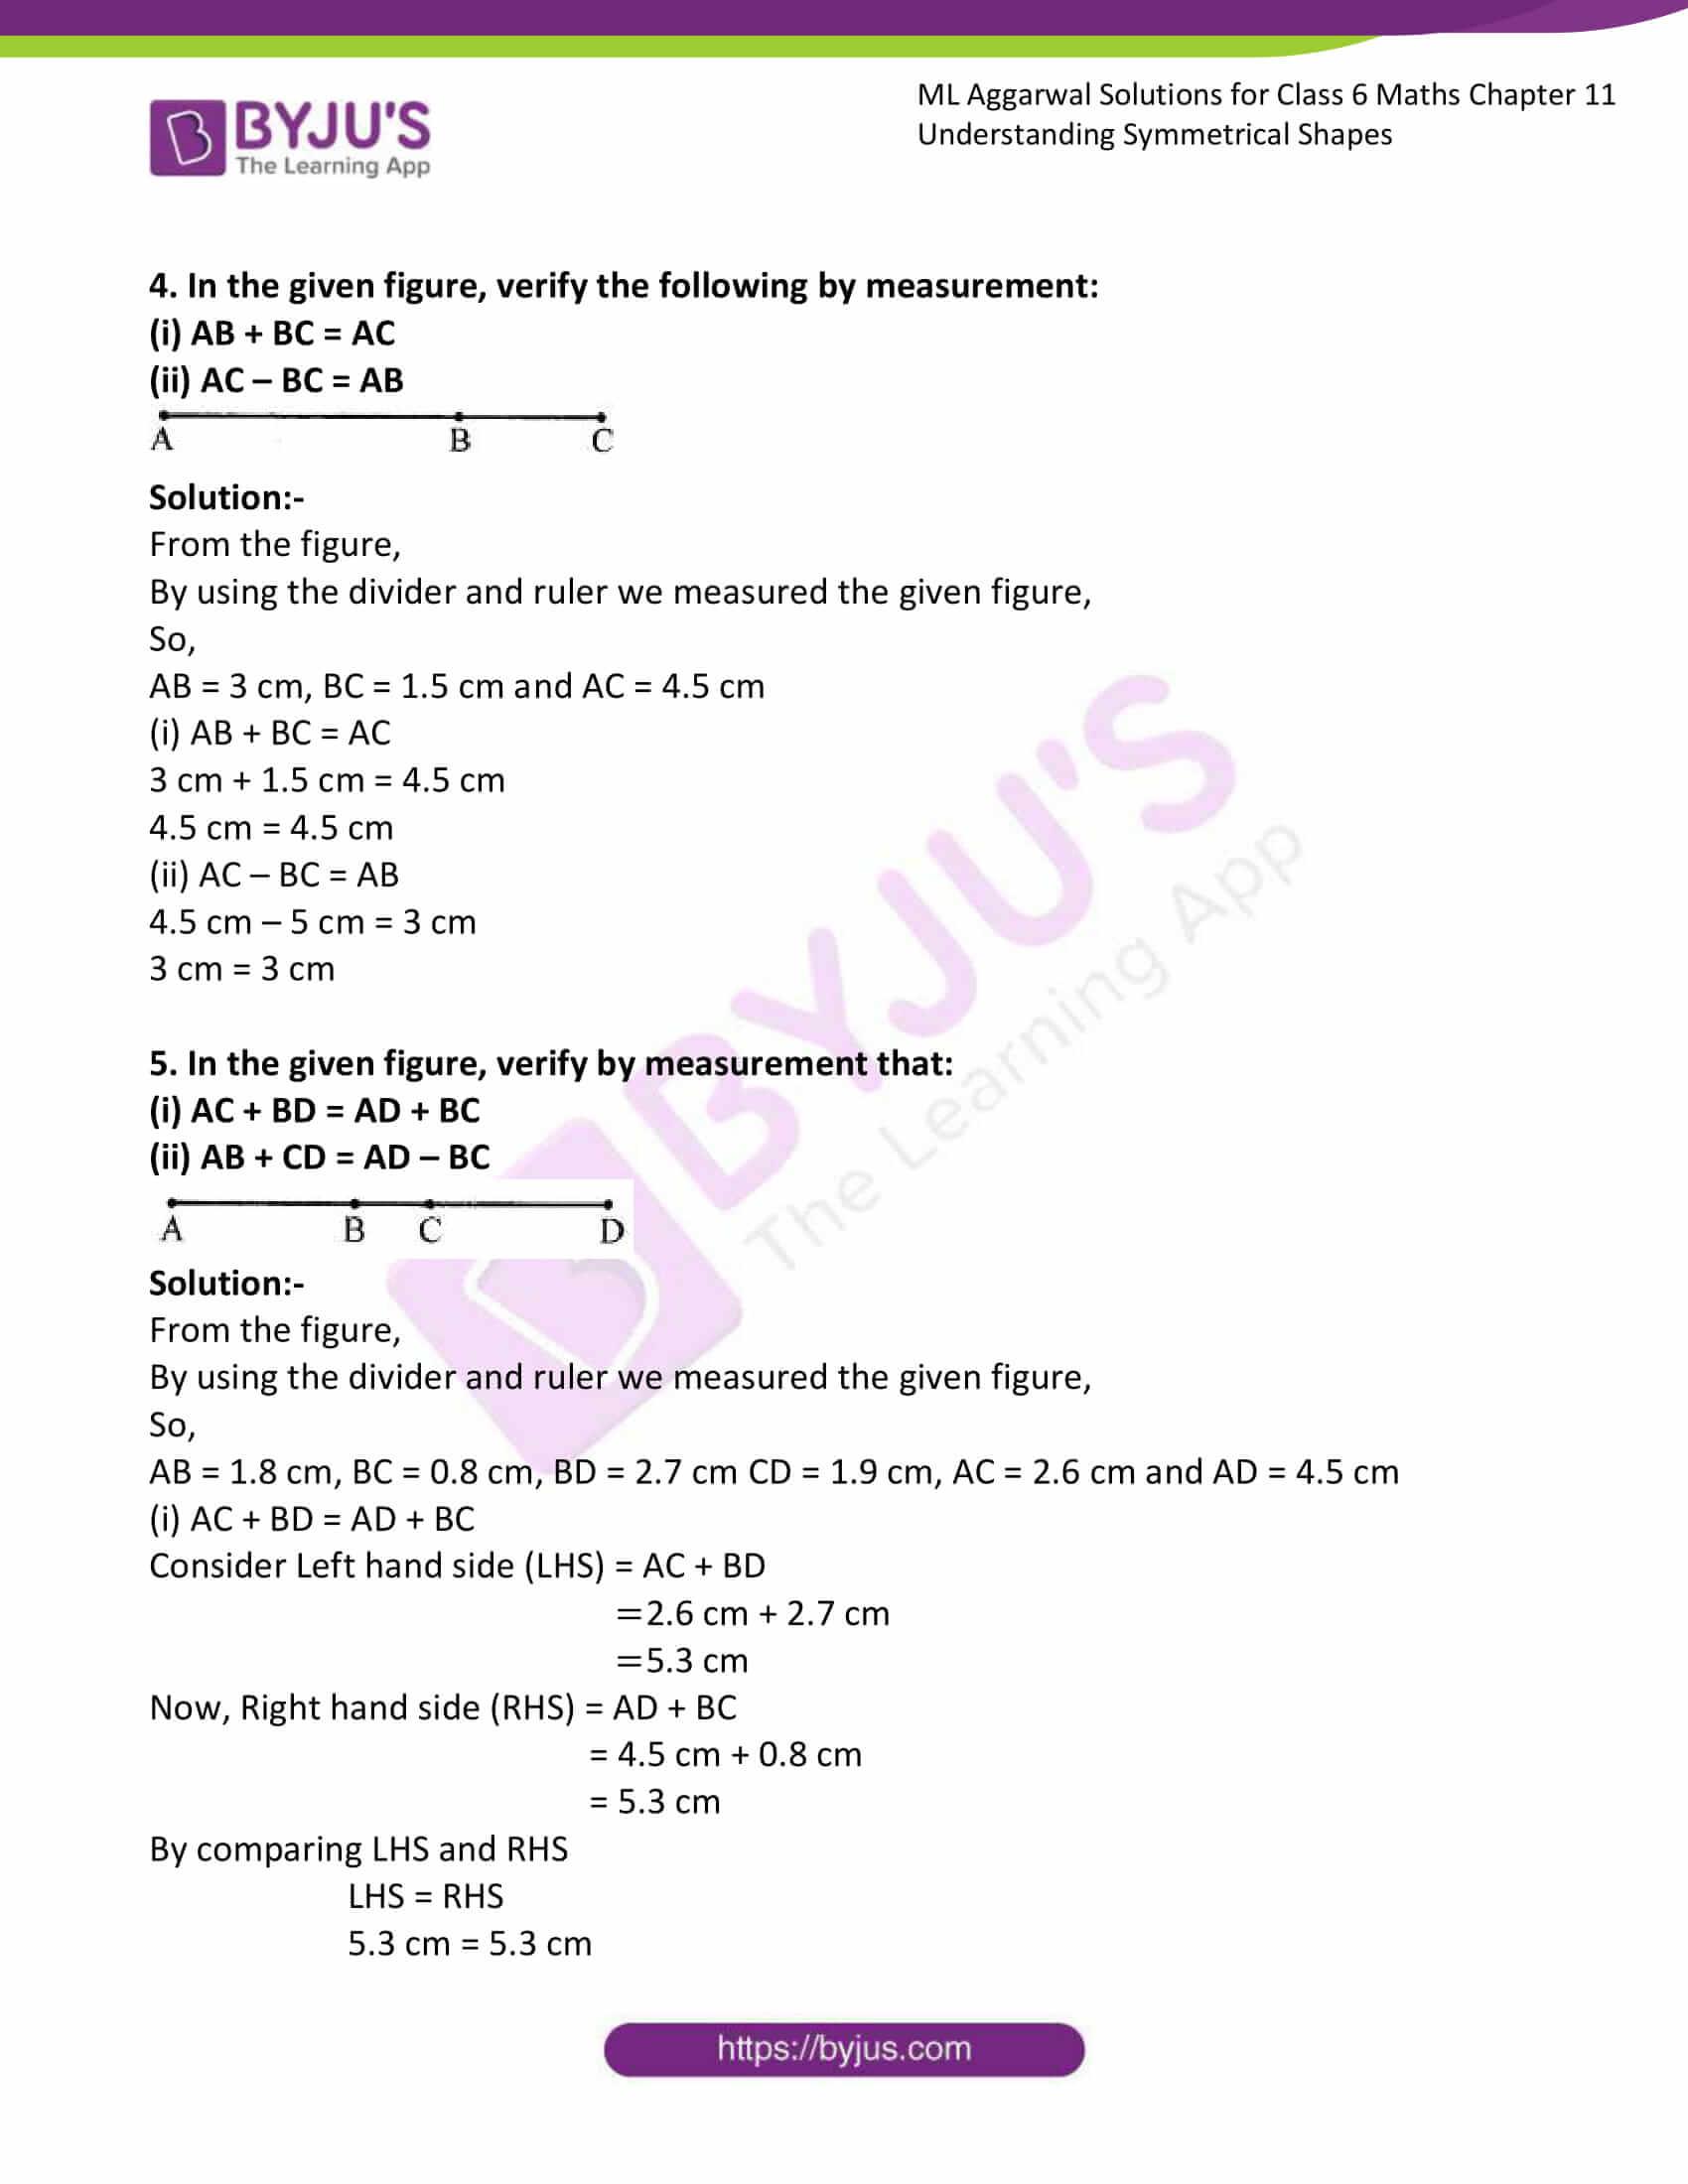 ml aggarwal sol class 6 maths chapter 11 2